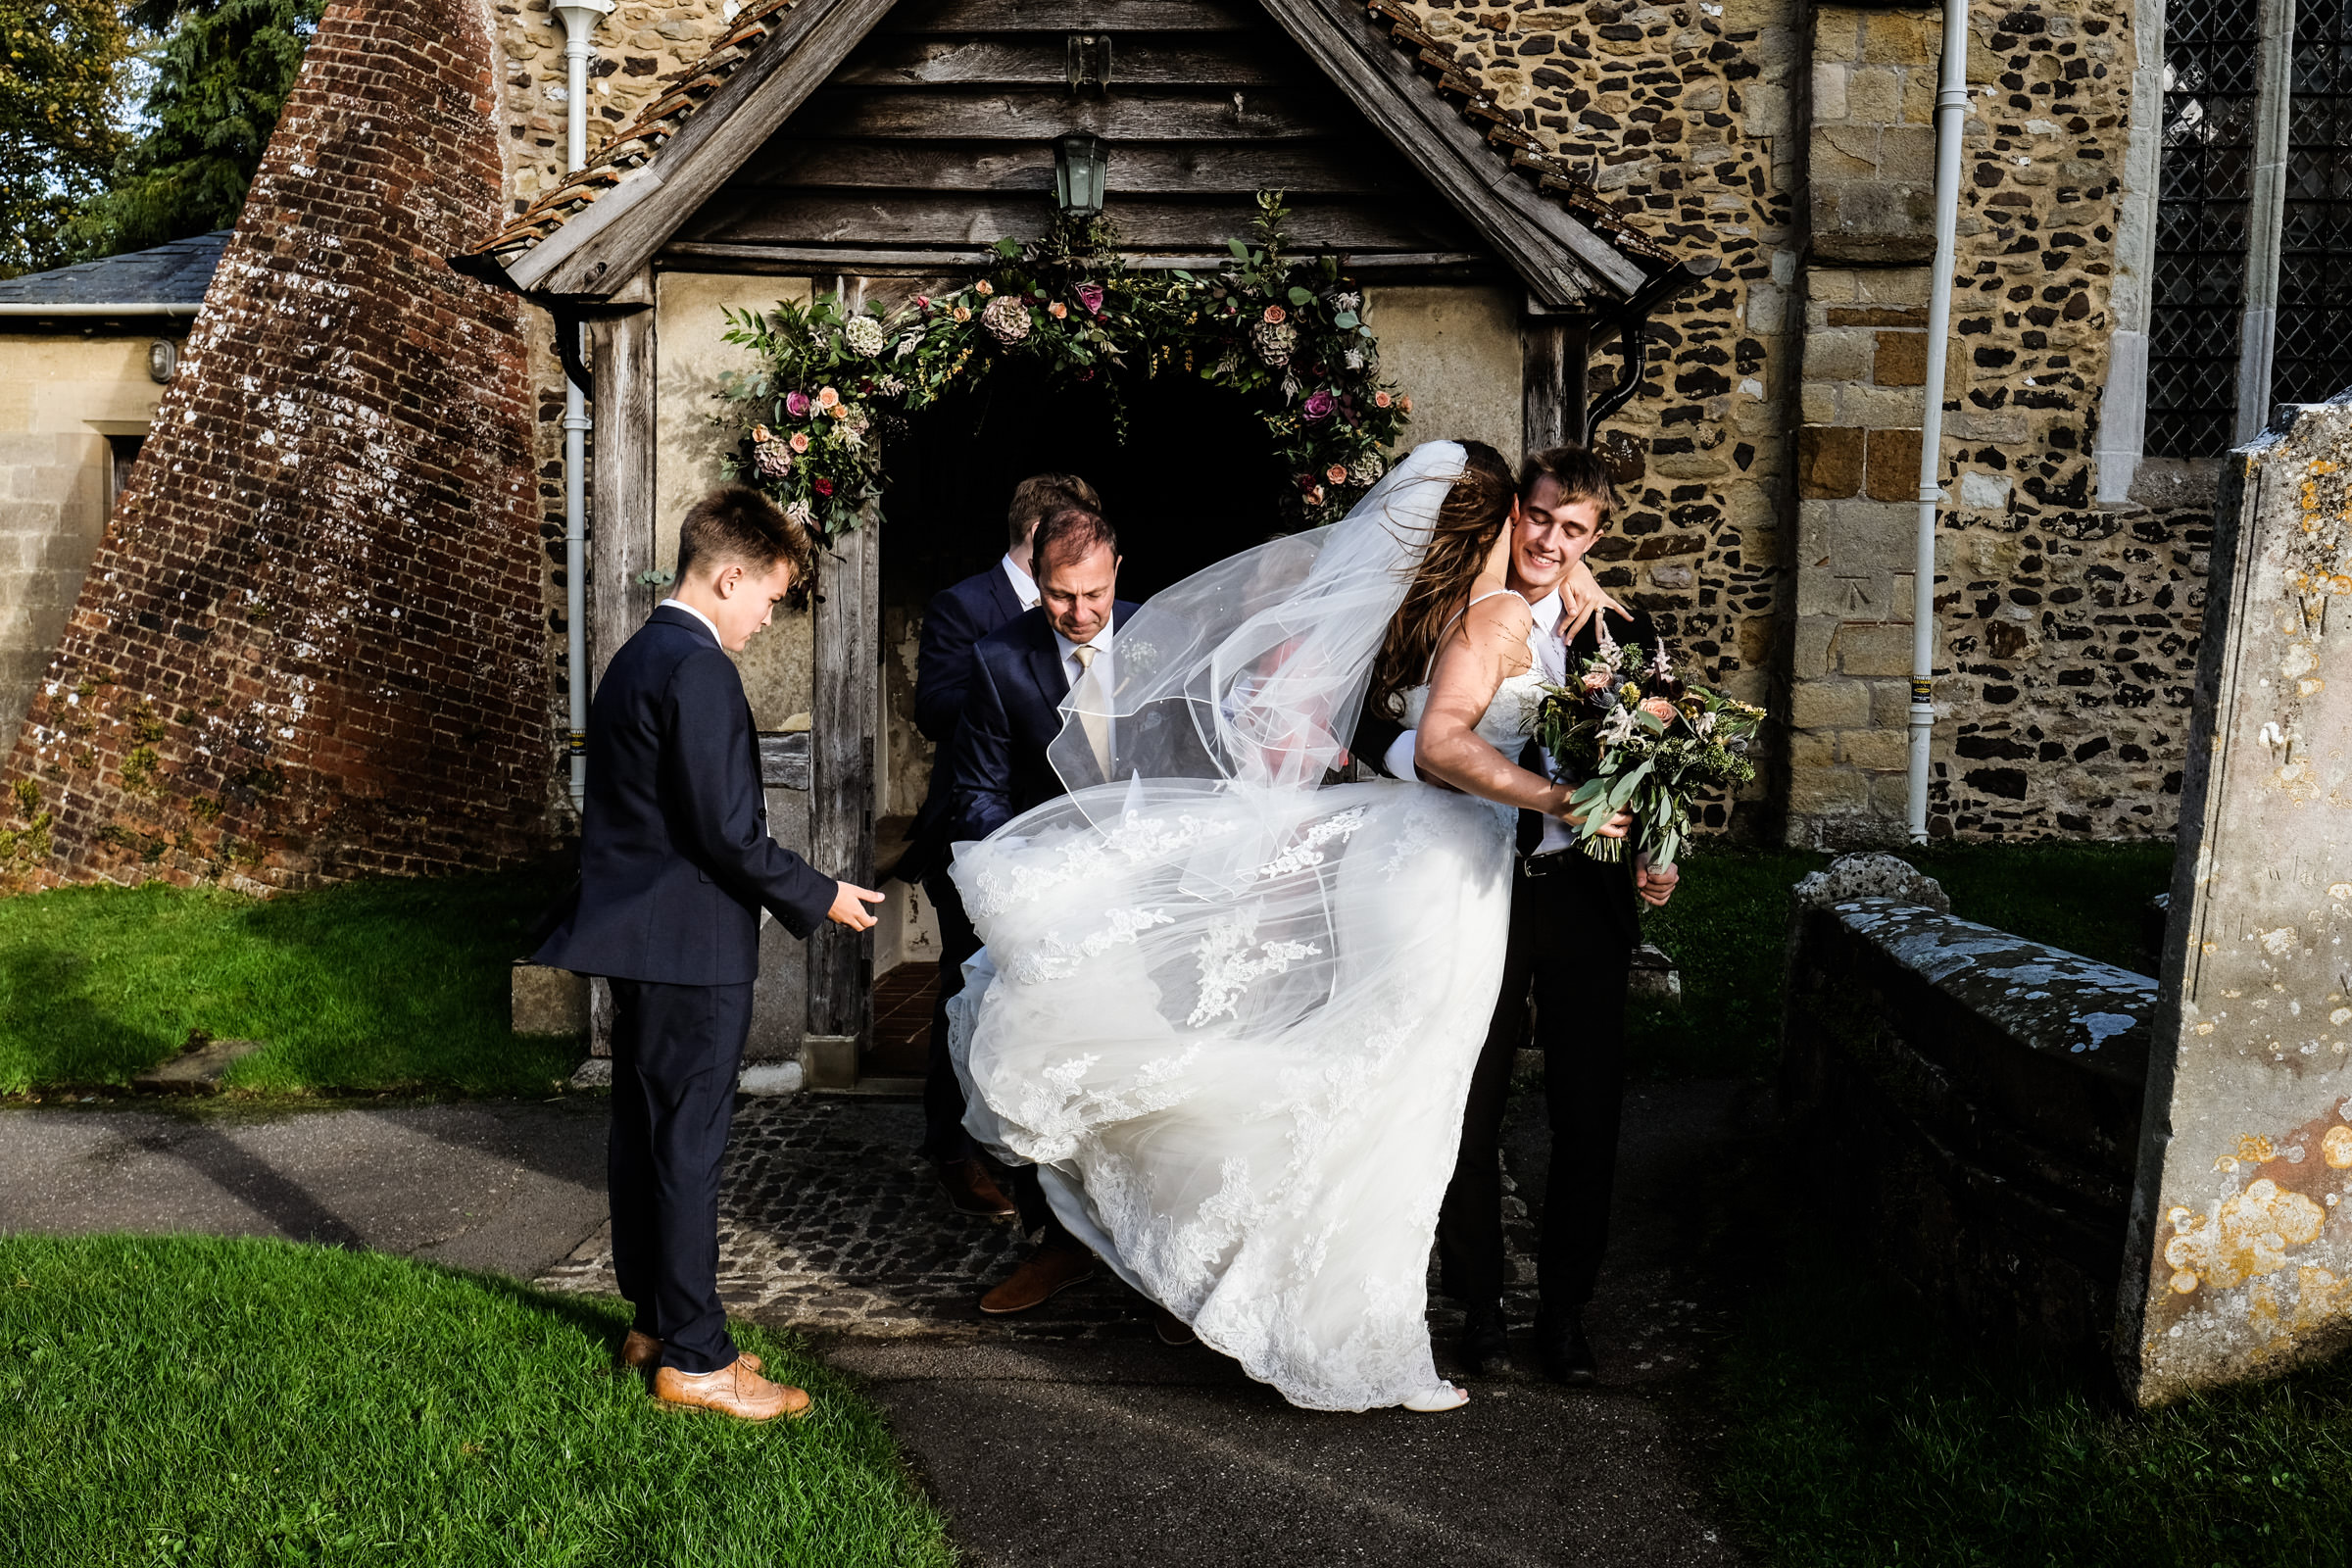 Natural+wedding+photography+portfolio+108.jpg